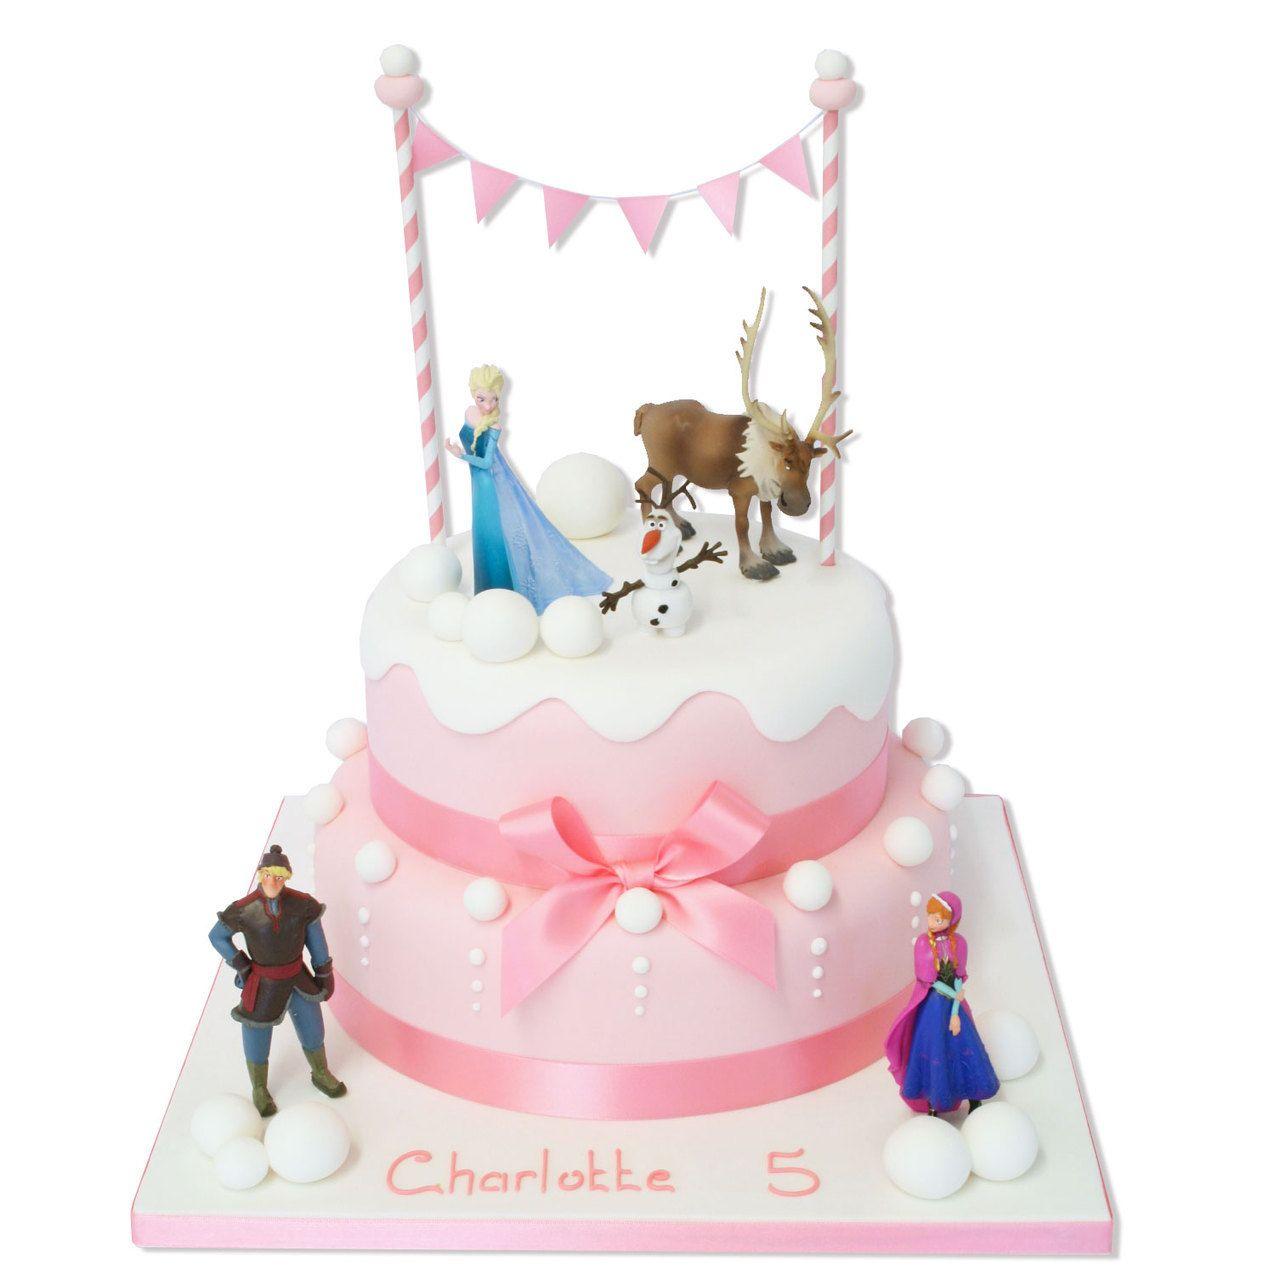 Bad ka design pretty pink frozen cake  happy birthday  pinterest  cake d